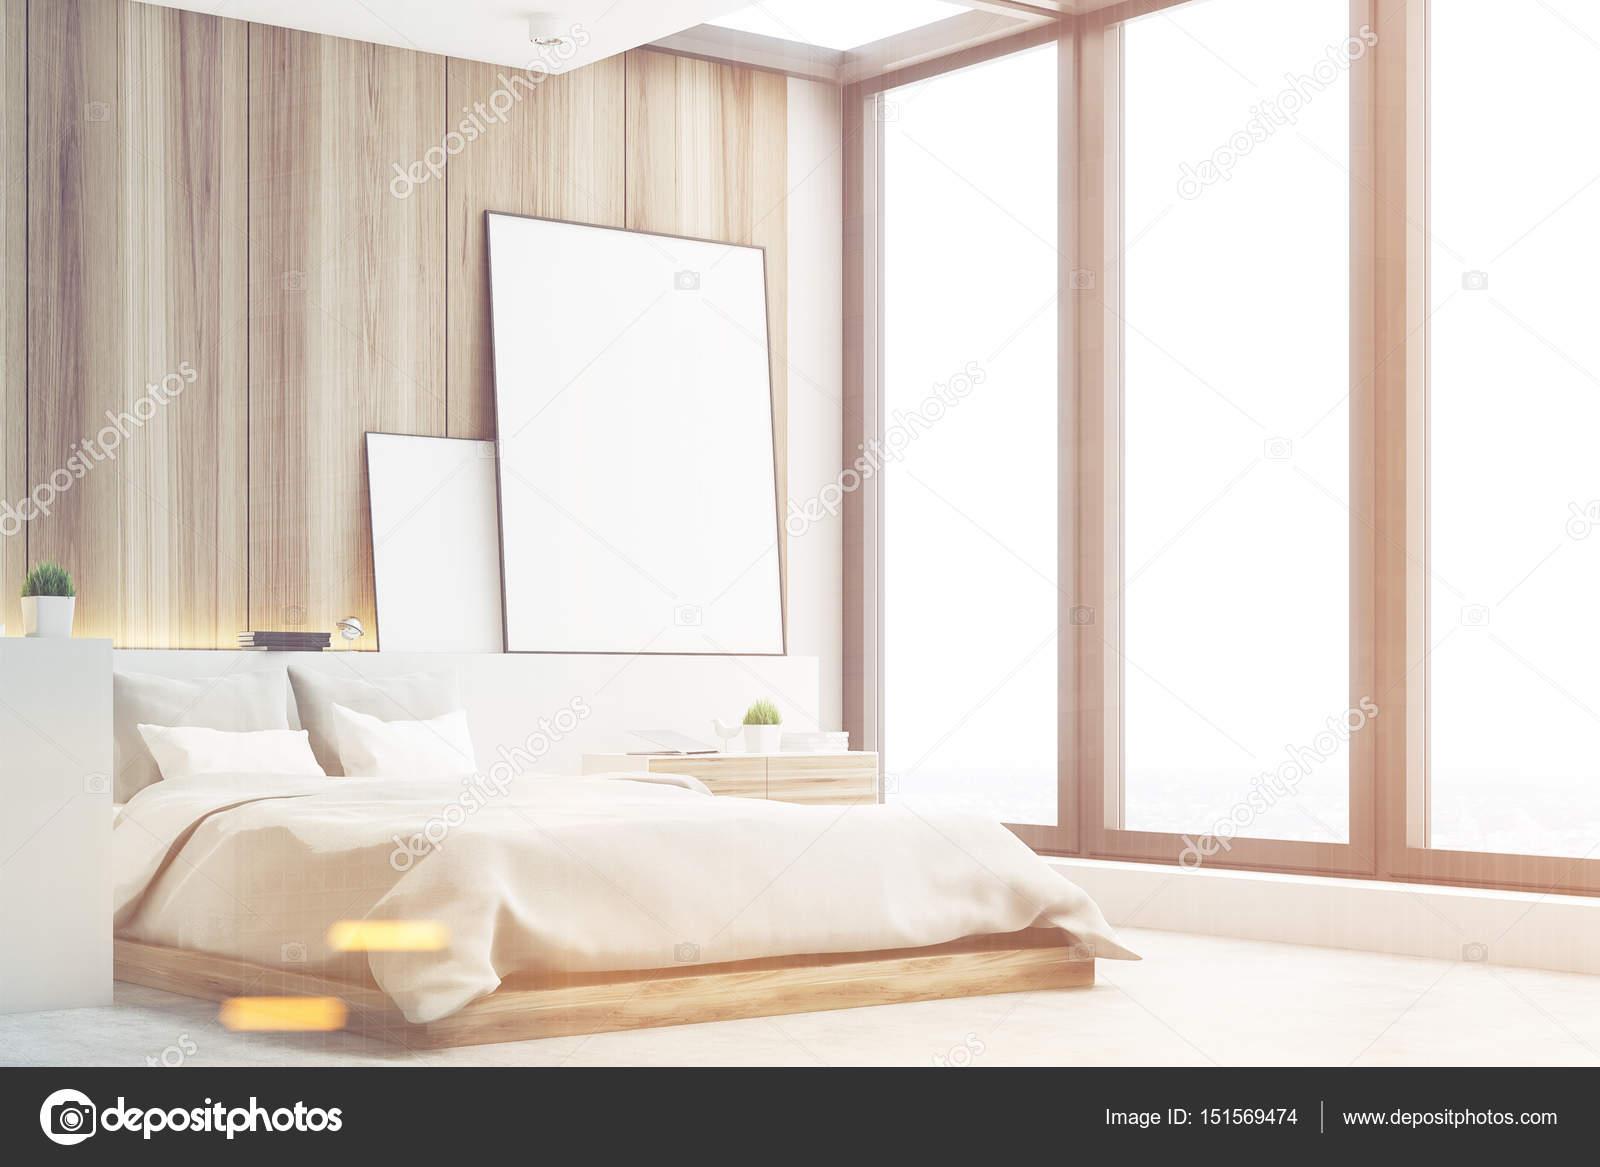 https://st3.depositphotos.com/2673929/15156/i/1600/depositphotos_151569474-stockafbeelding-lichte-slaapkamer-hout-kant-afgezwakt.jpg